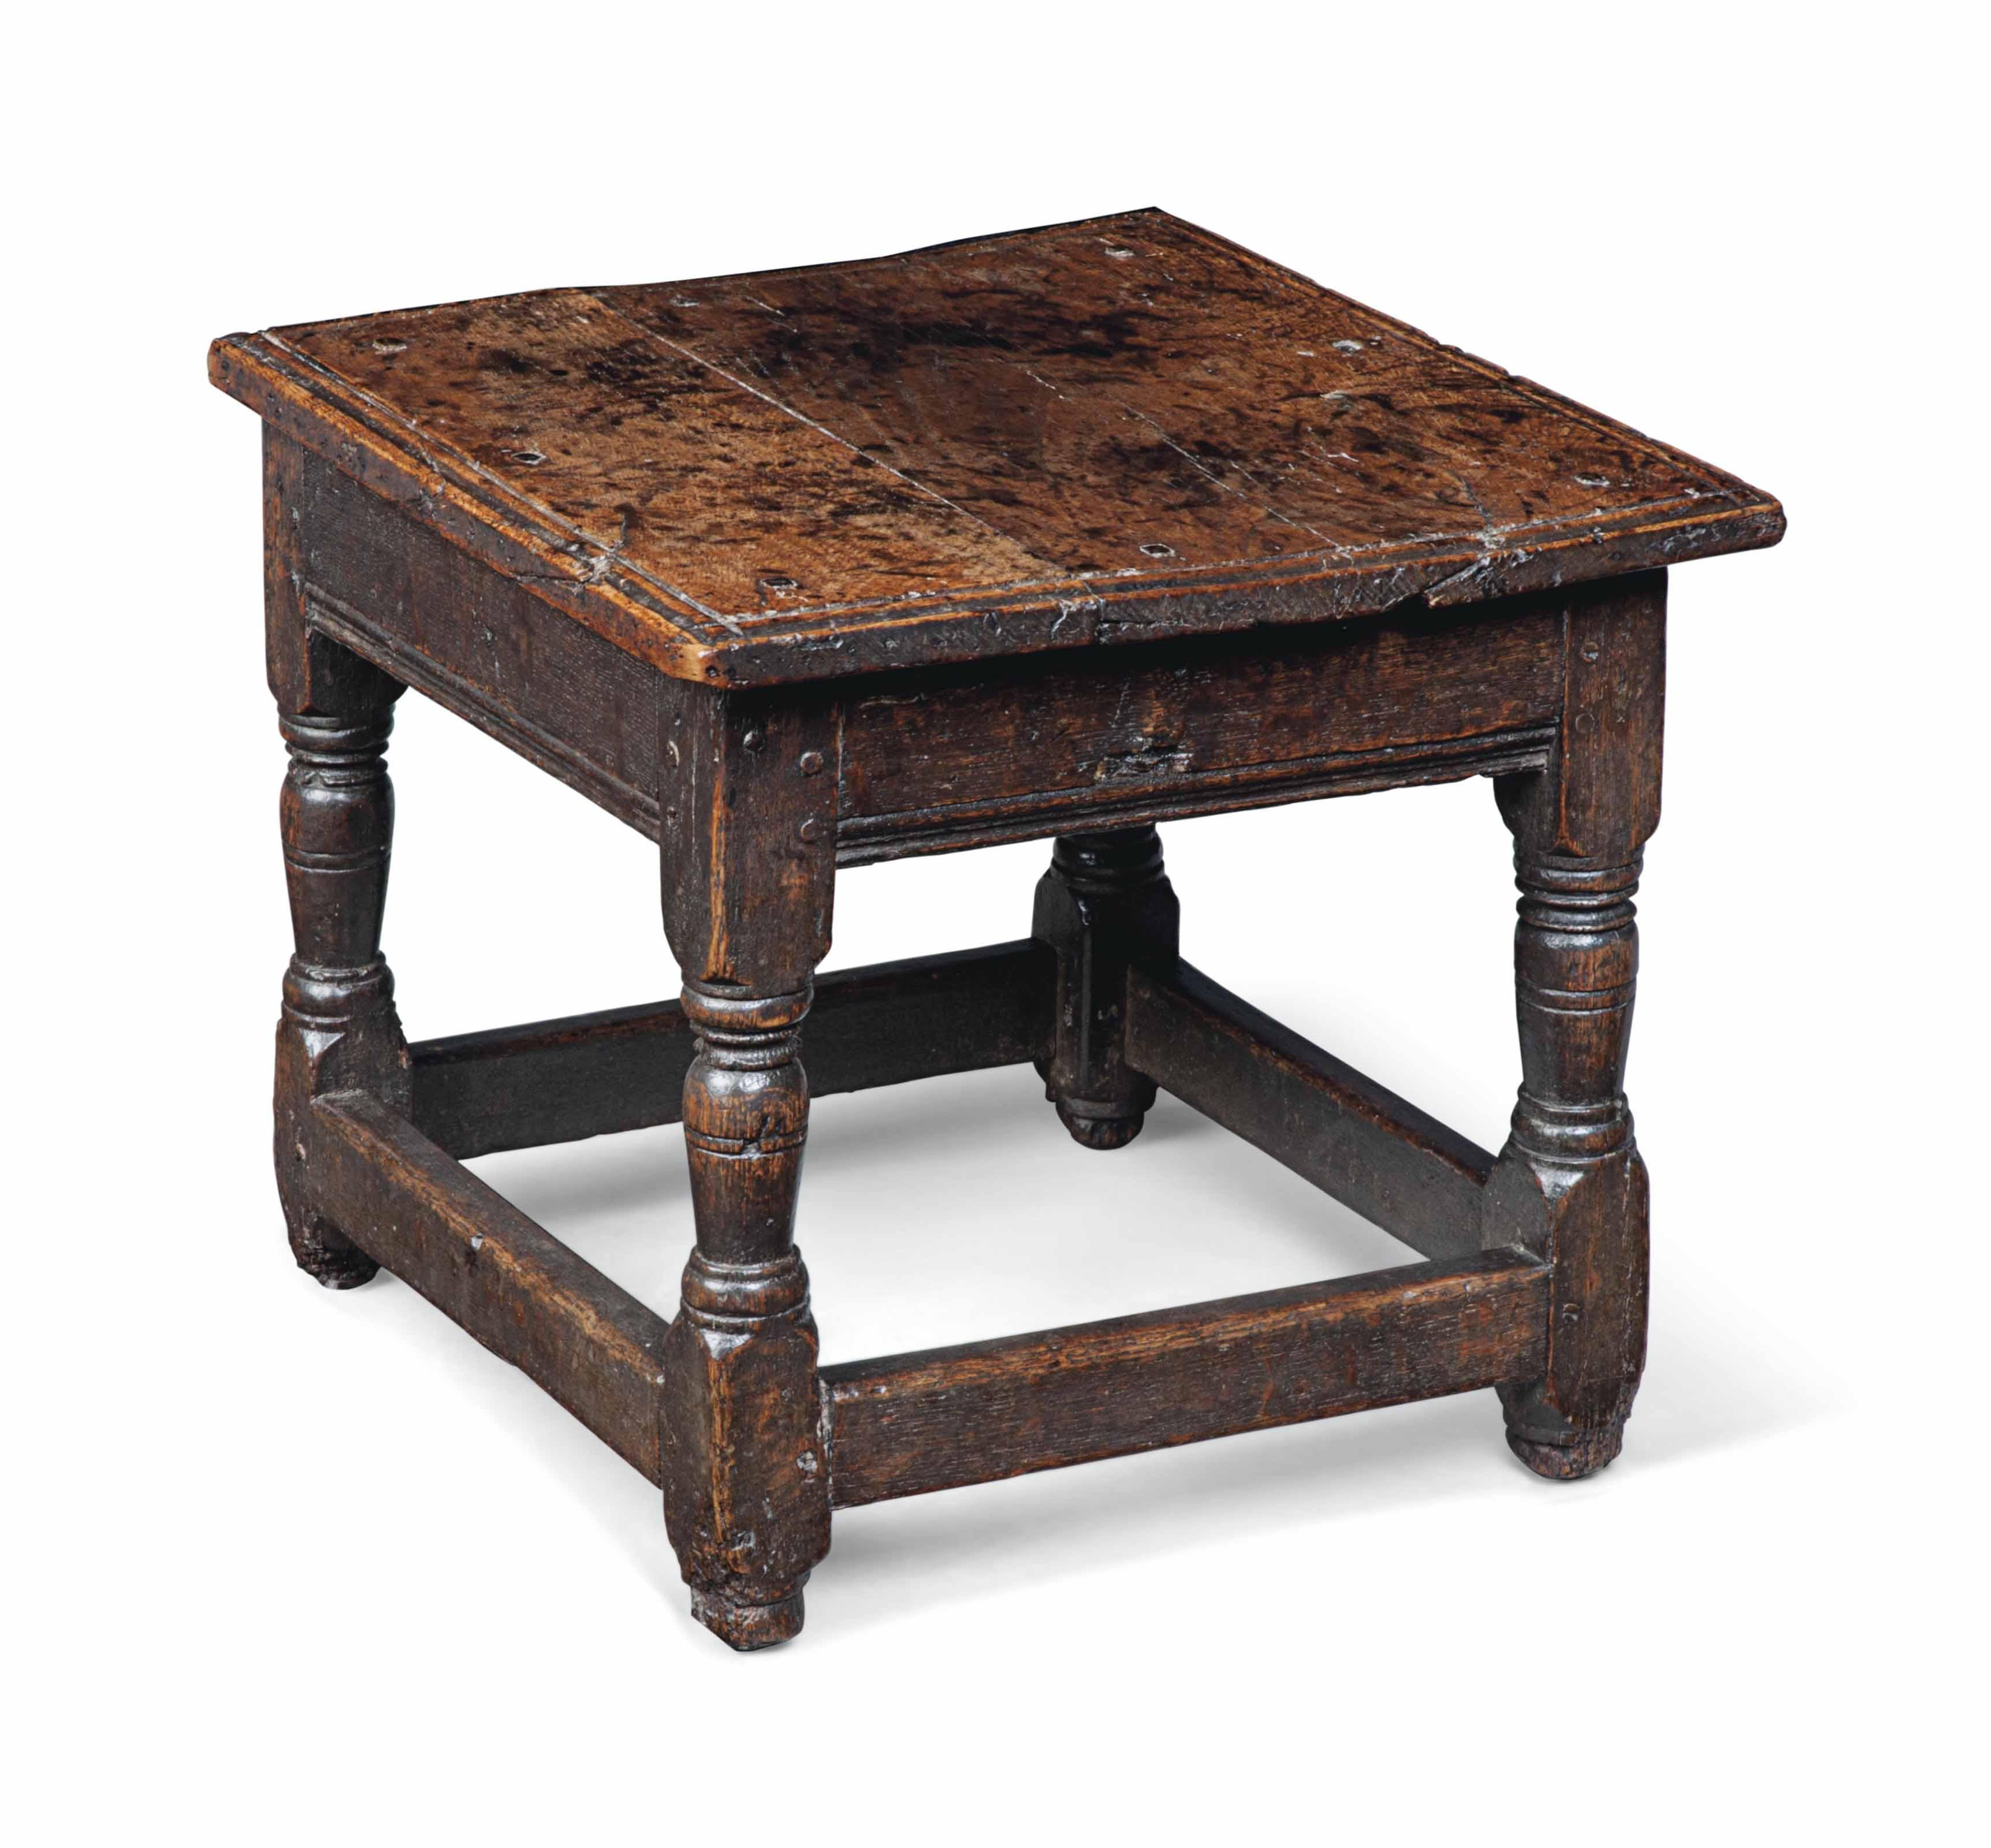 AN ELIZABETHAN SQUARE LOW TABL